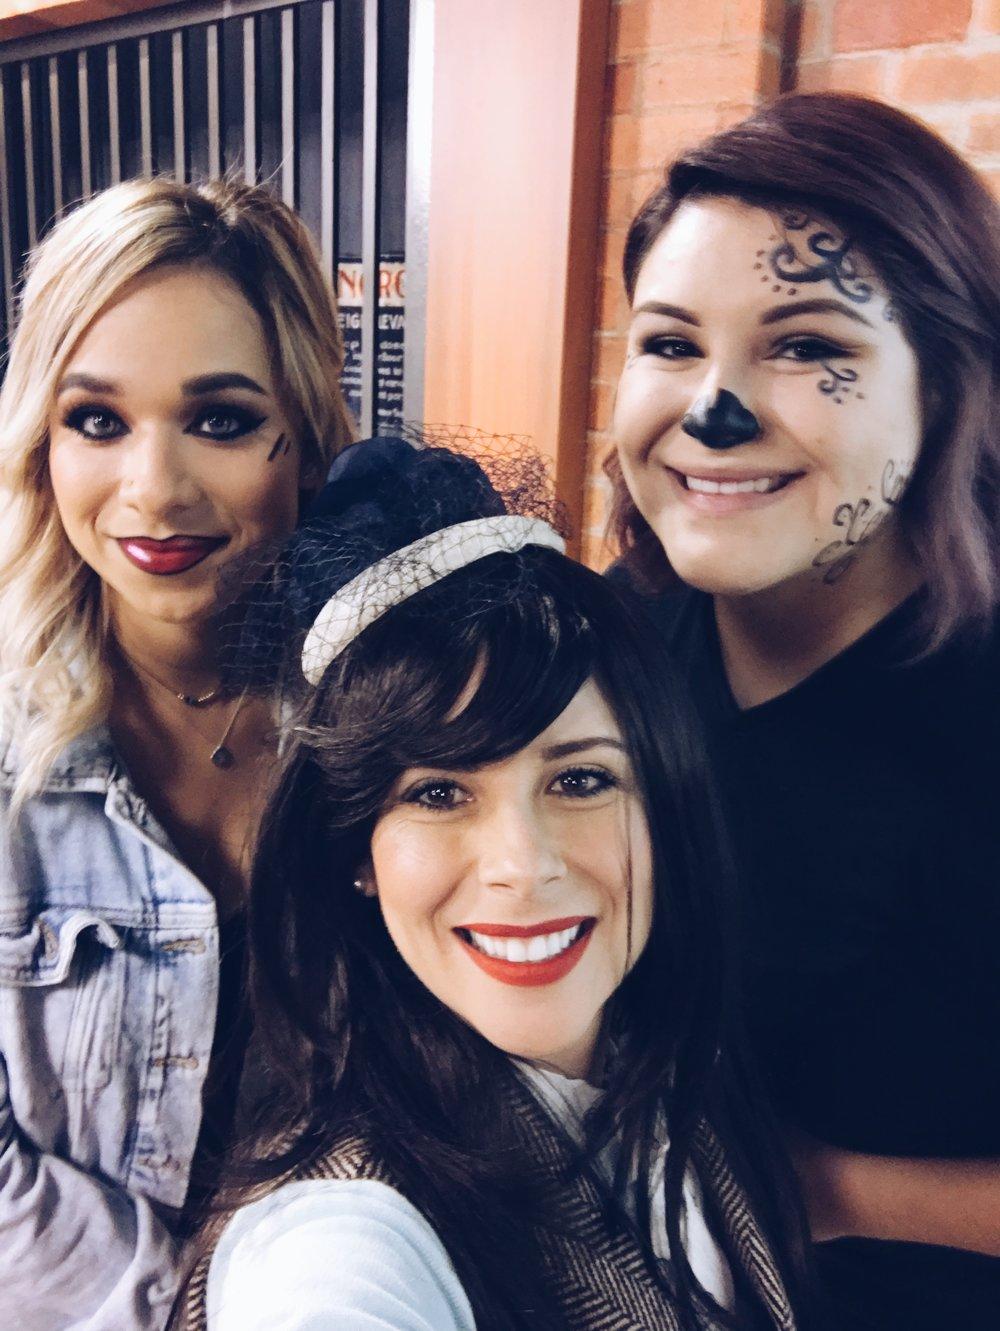 Halloweenmakeup2017gooddaysacramentolibierbeautyblog_2.JPG